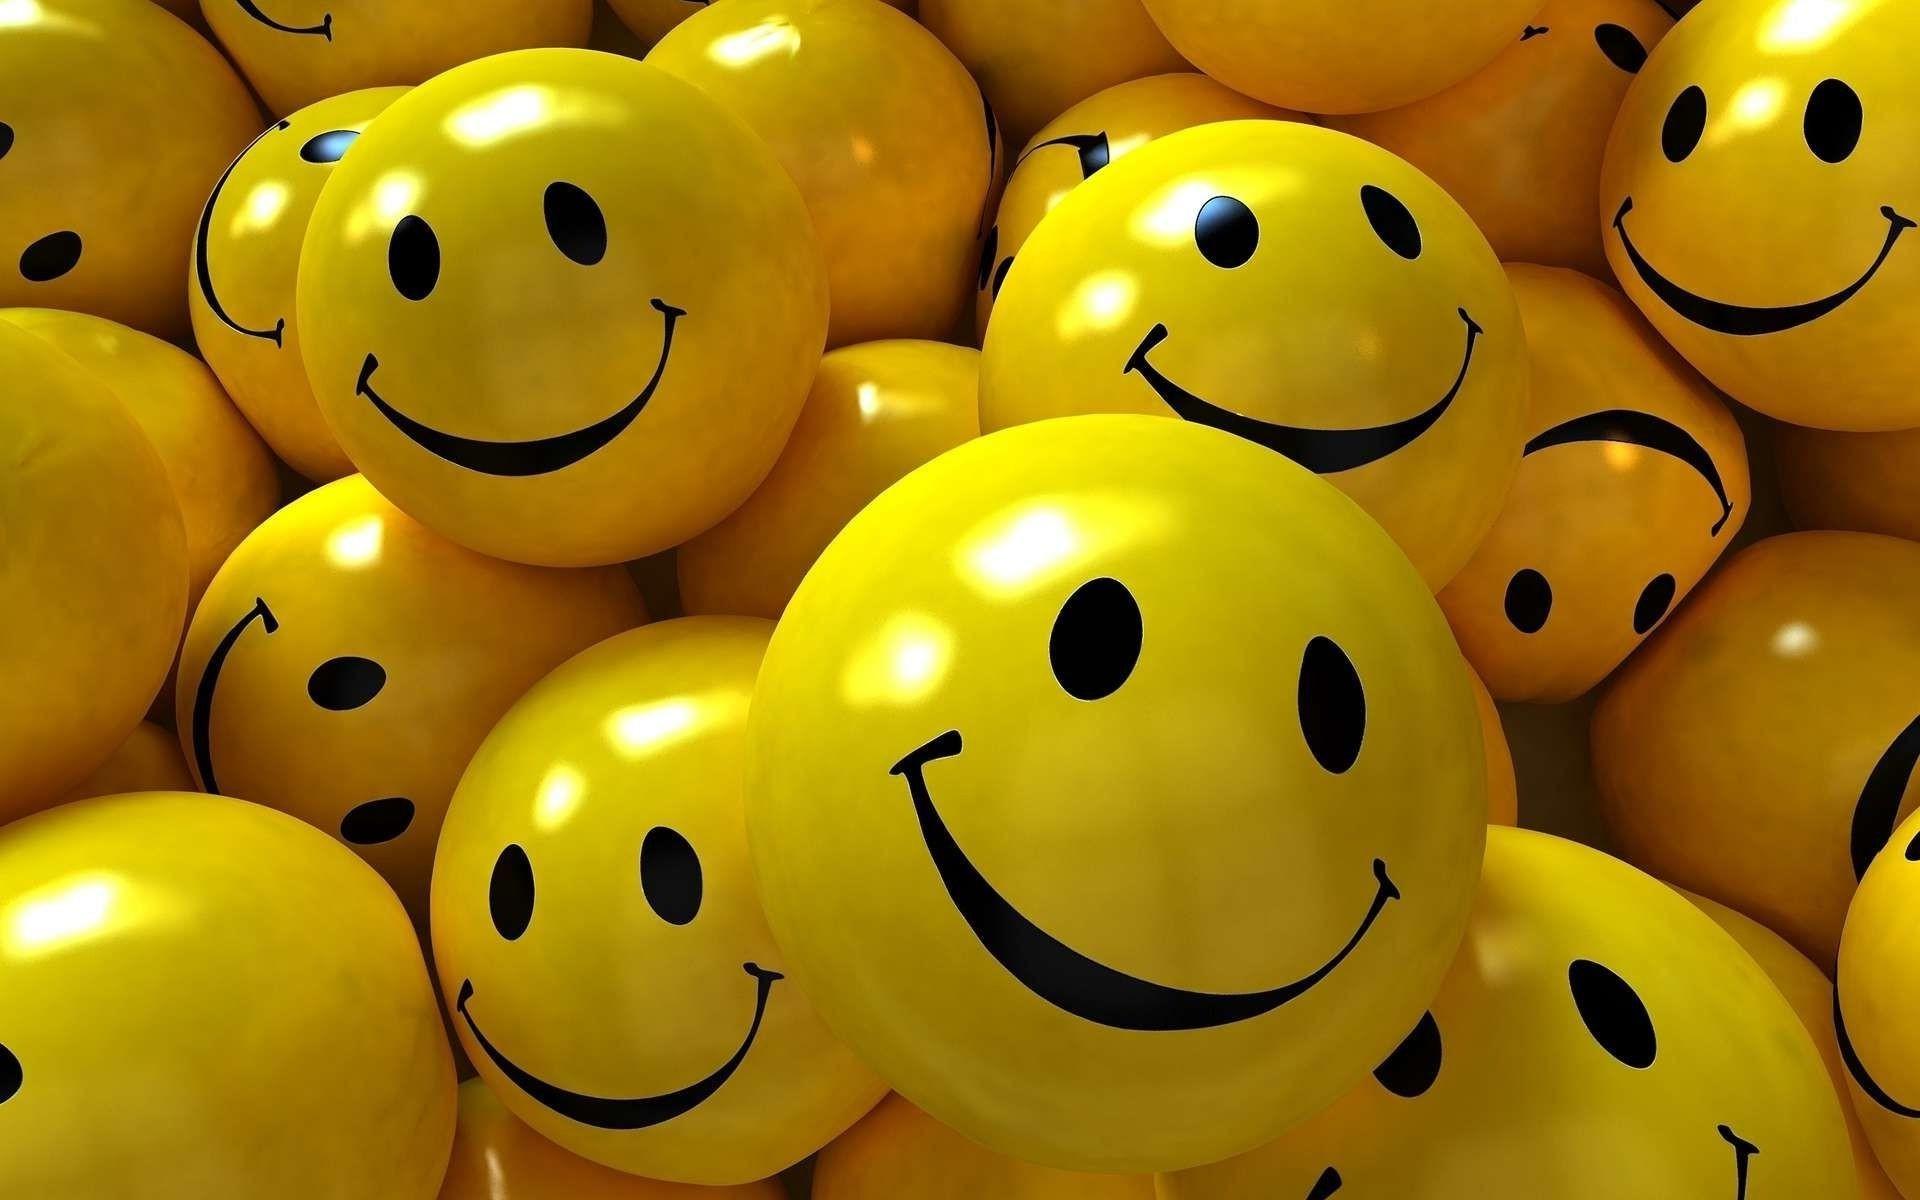 emoji face wallpaper (54+ images)